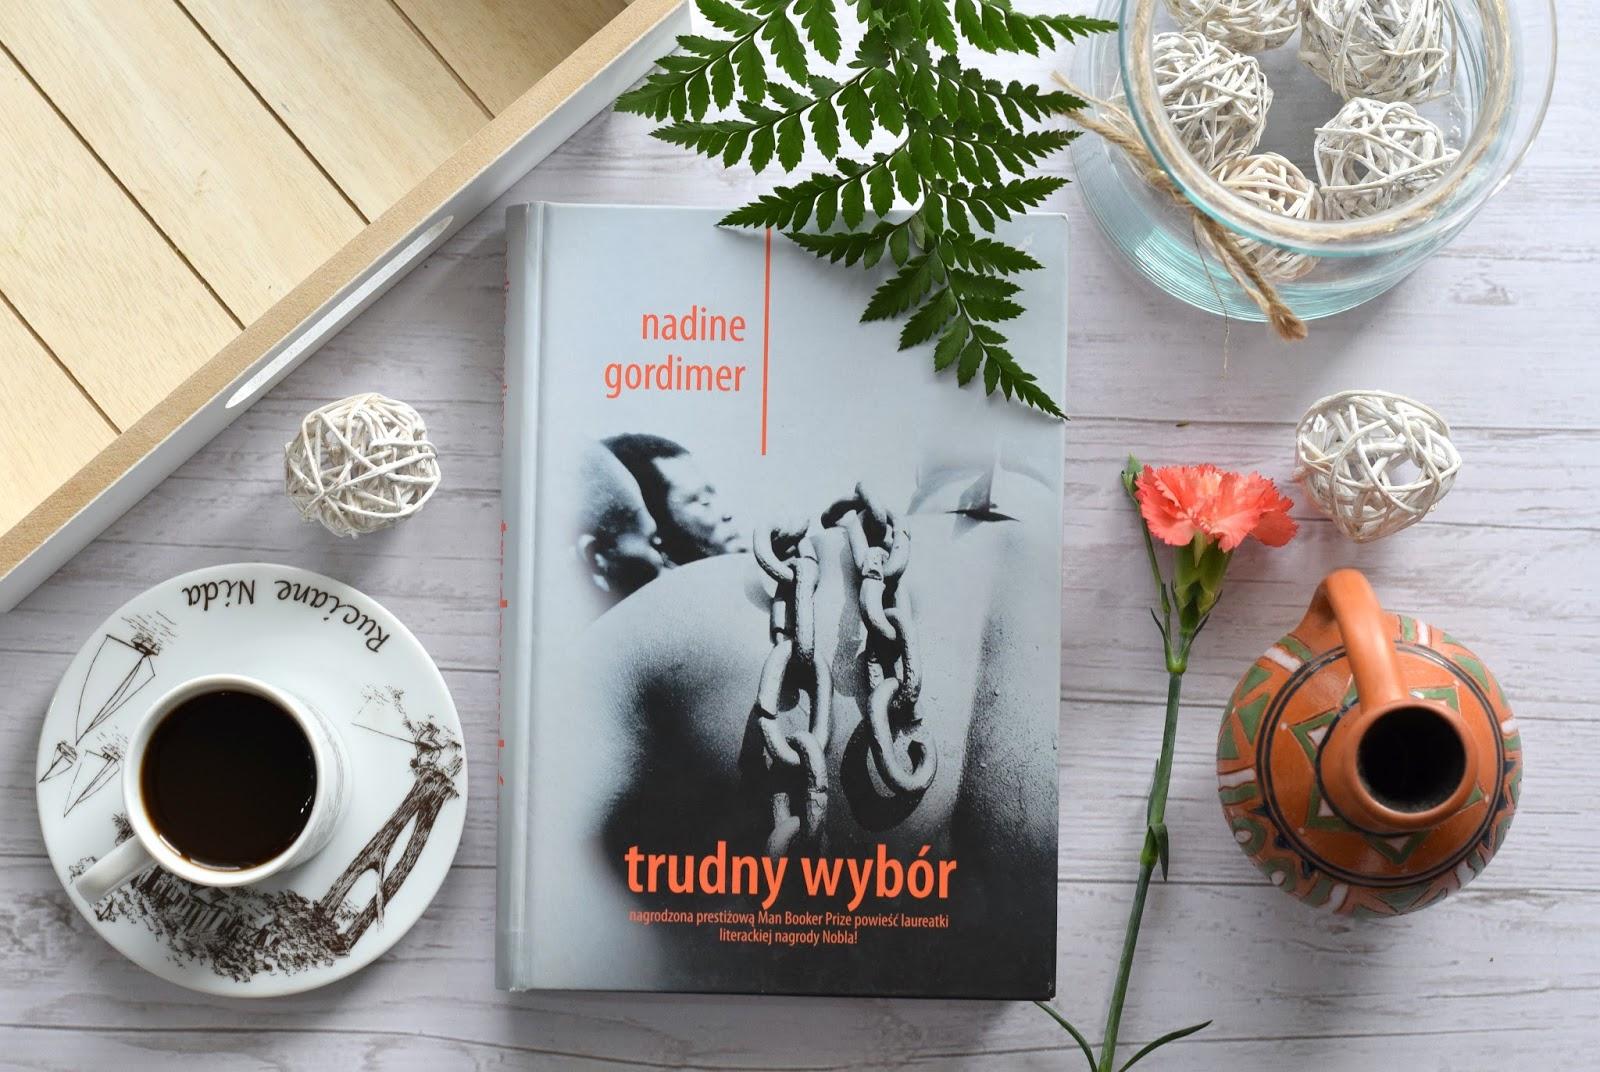 """TRUDNY WYBÓR"" - NADINE GORDIMER"